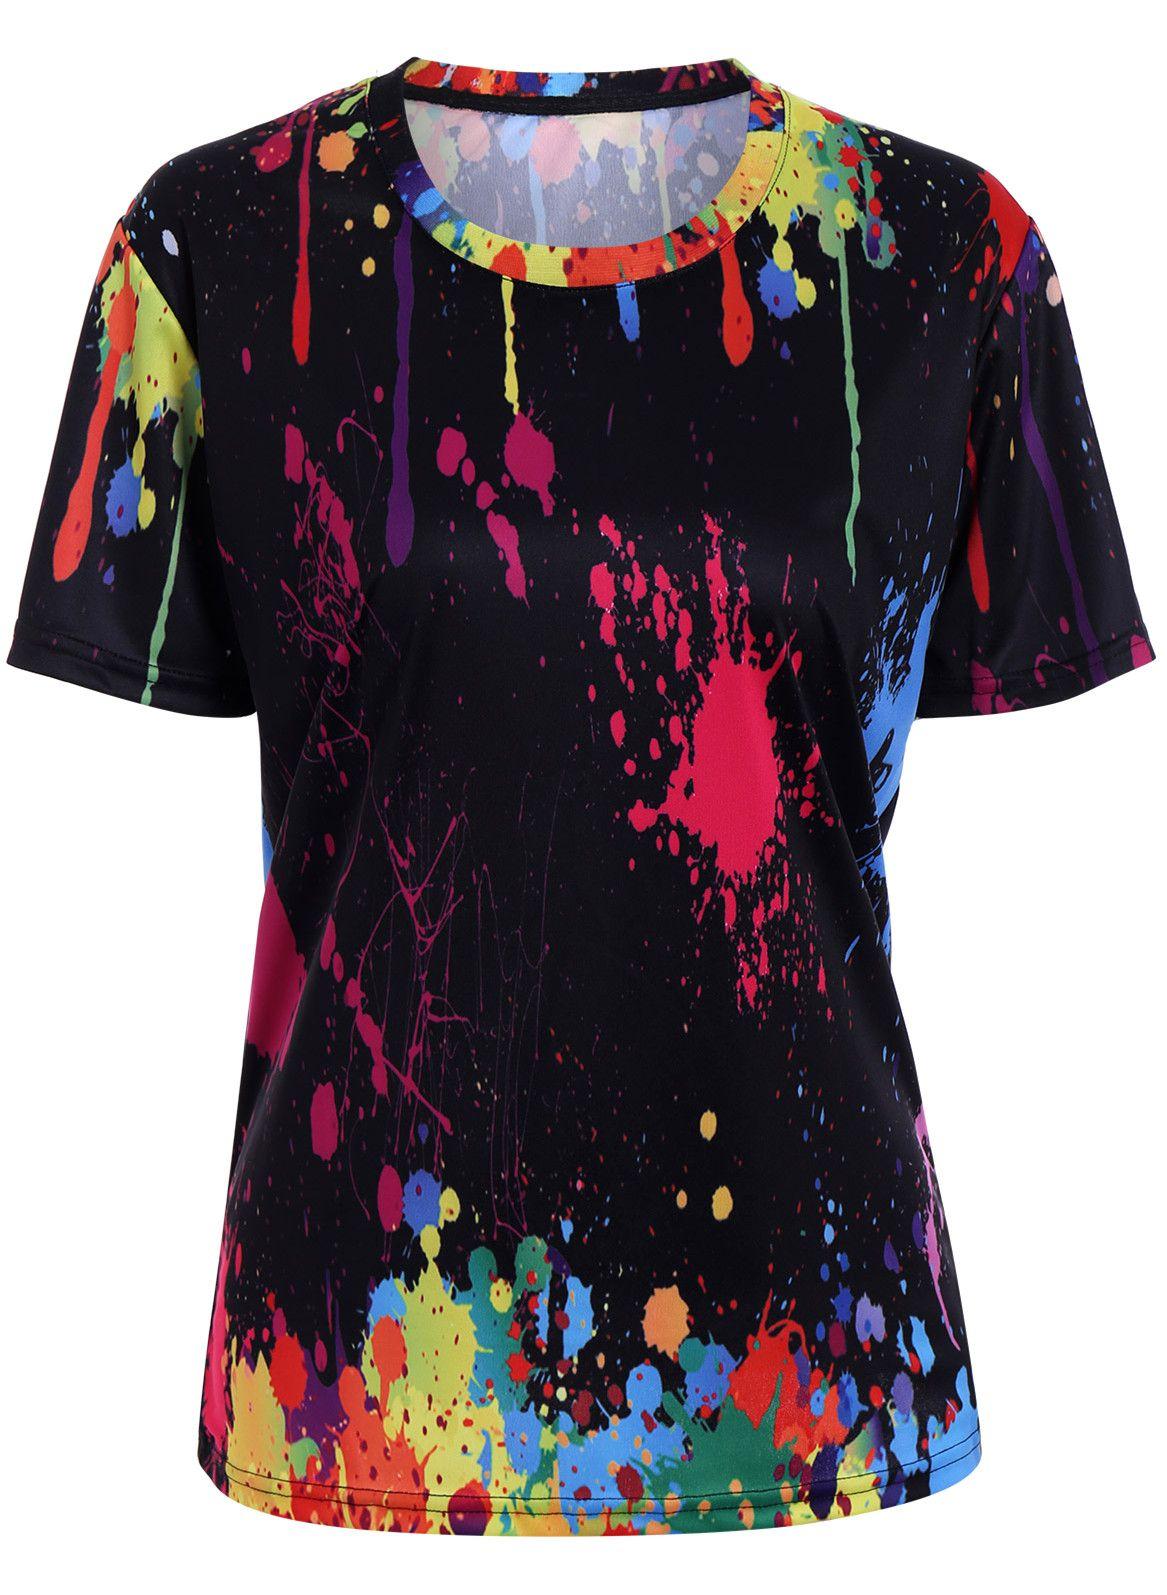 0810b37f Crew Neck Colorful Splatter Paint Print T-Shirt. $12.05 Splatter Paint Tee  - Black